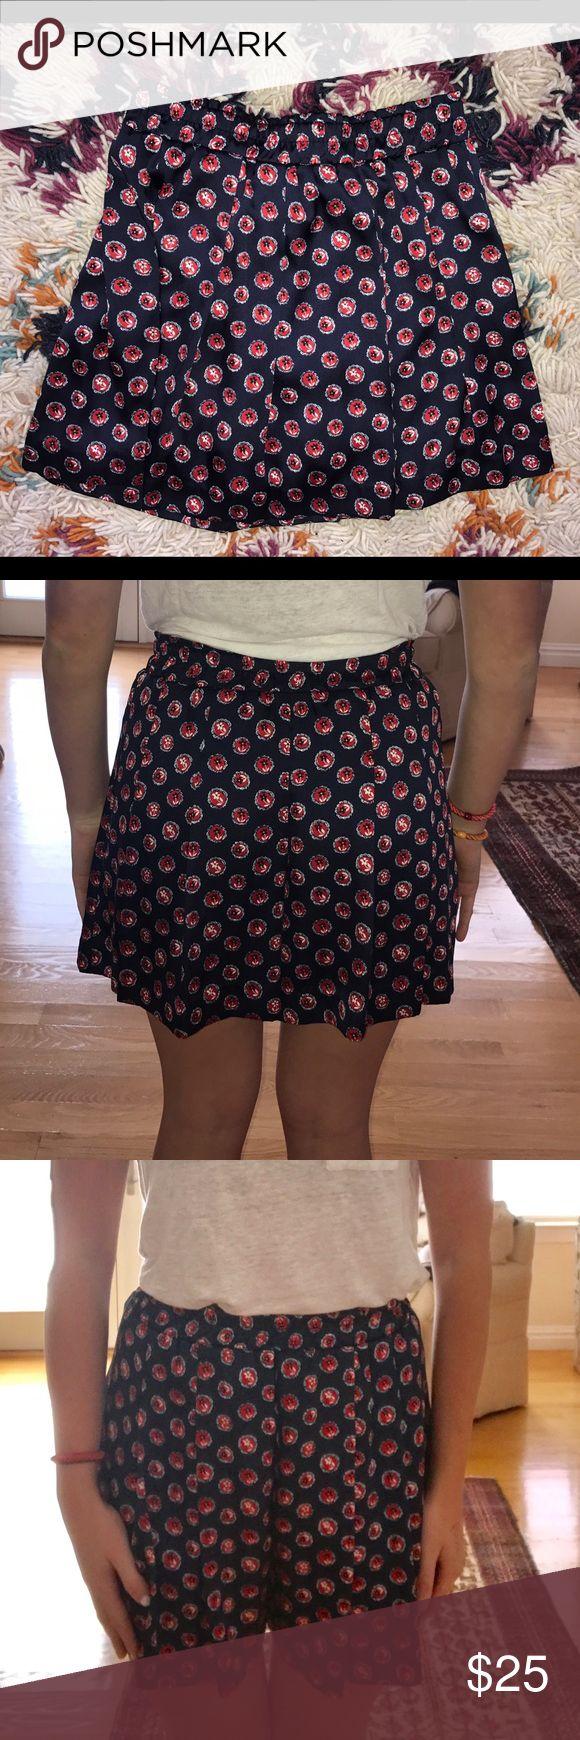 Uniqlo silk printed shorts Uniqlo silk printed shorts with sinch waist. Never worn. Looks like a skirt when worn. Uniqlo Shorts